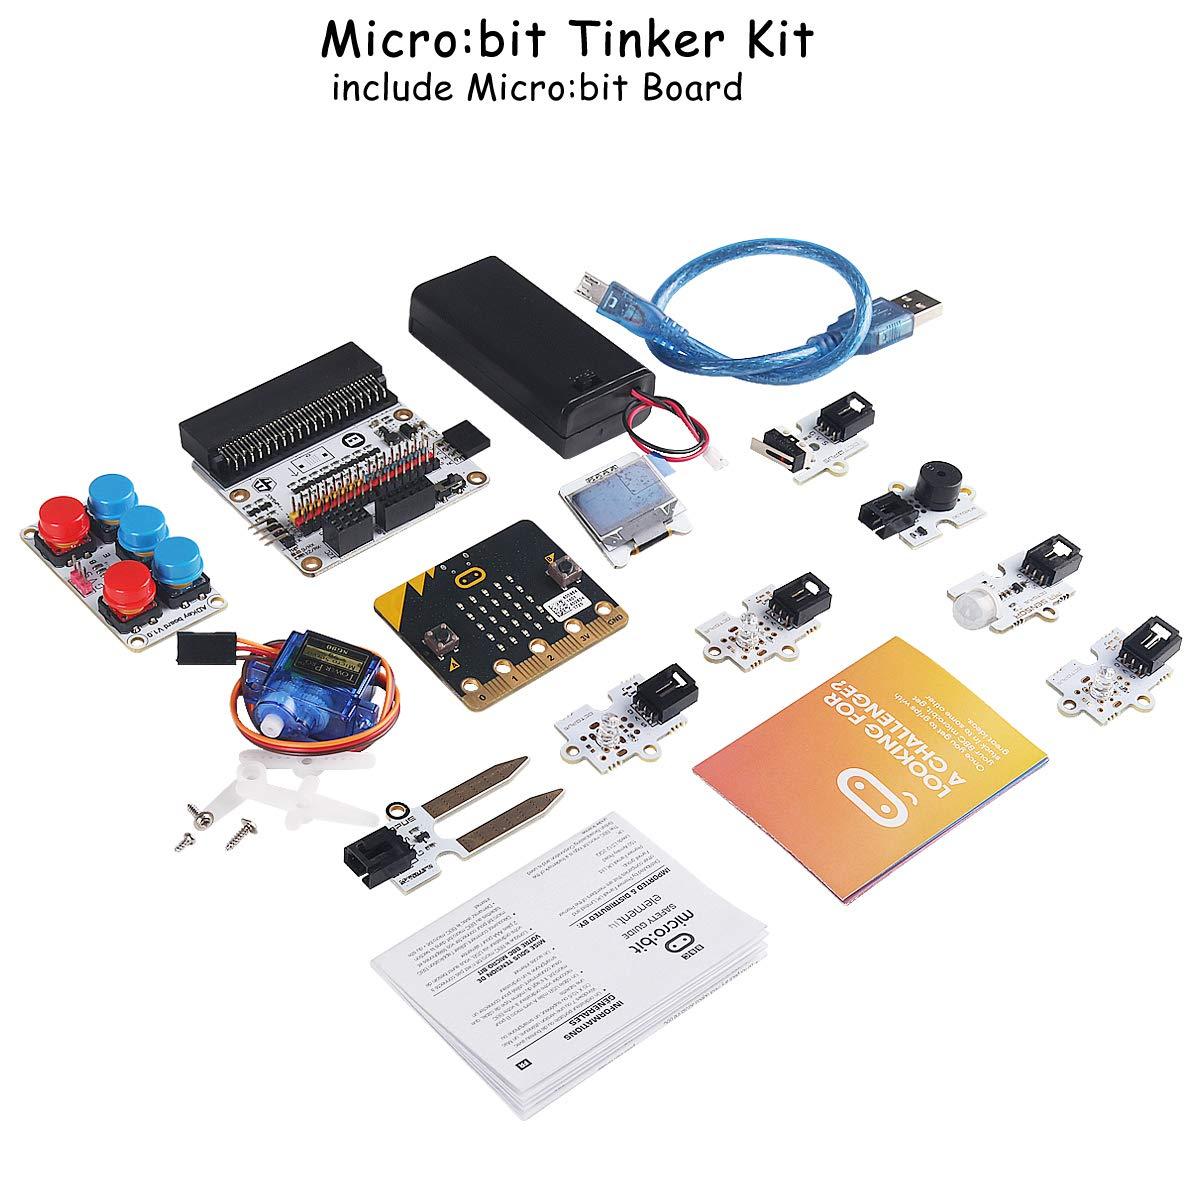 MakerFocus BBC Micro:bit Starter Kit Tinker Kit Include Micro:bit Board, Micro:bit Breakout Board, Octopus PIR Sensor Module Used for Classroom Teaching and for DIY Beginners